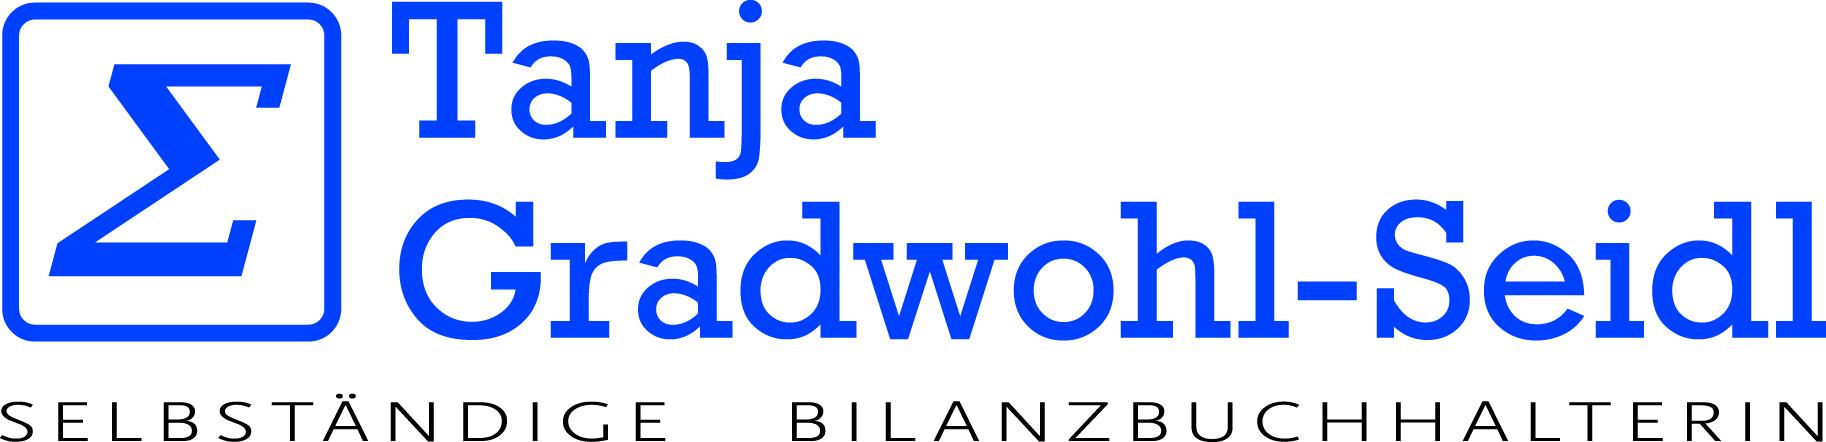 Tanja Gradwohl-Seidl Selbständige Bilanzbuchalterin